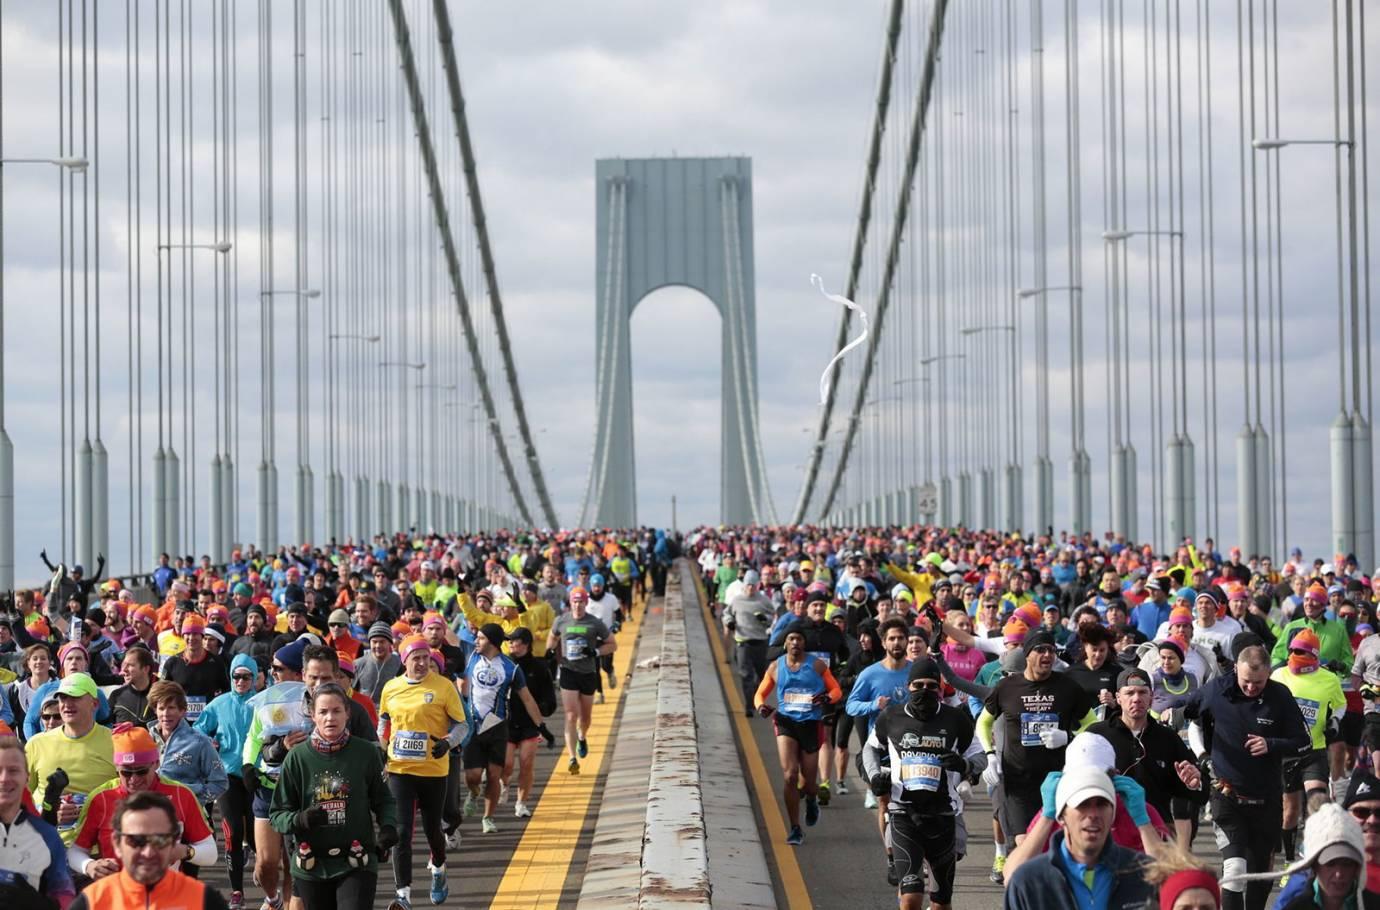 New-York-City-Marathon-Course-1380x910.jpg